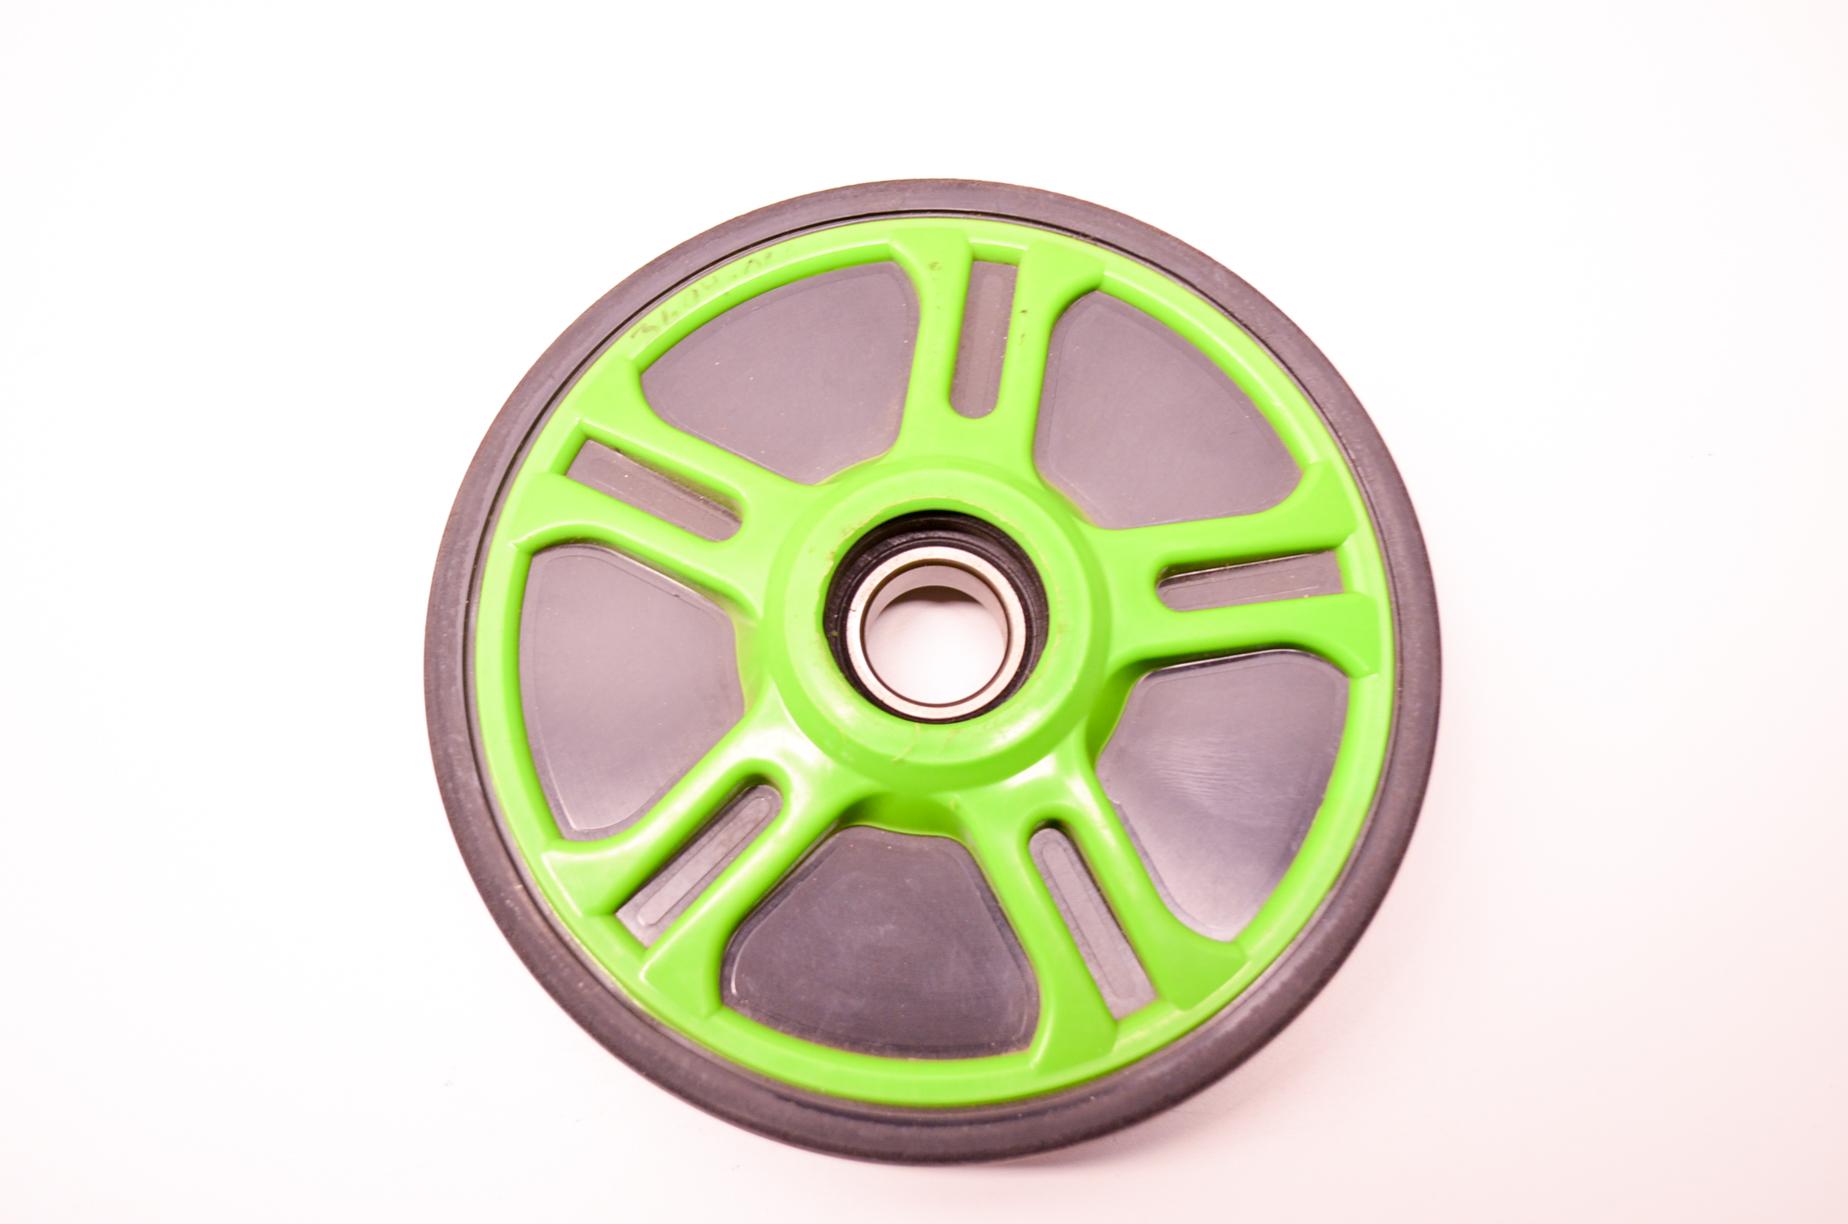 5.63 W.787 3604-039 Arctic Cat New OEM Idler Wheel